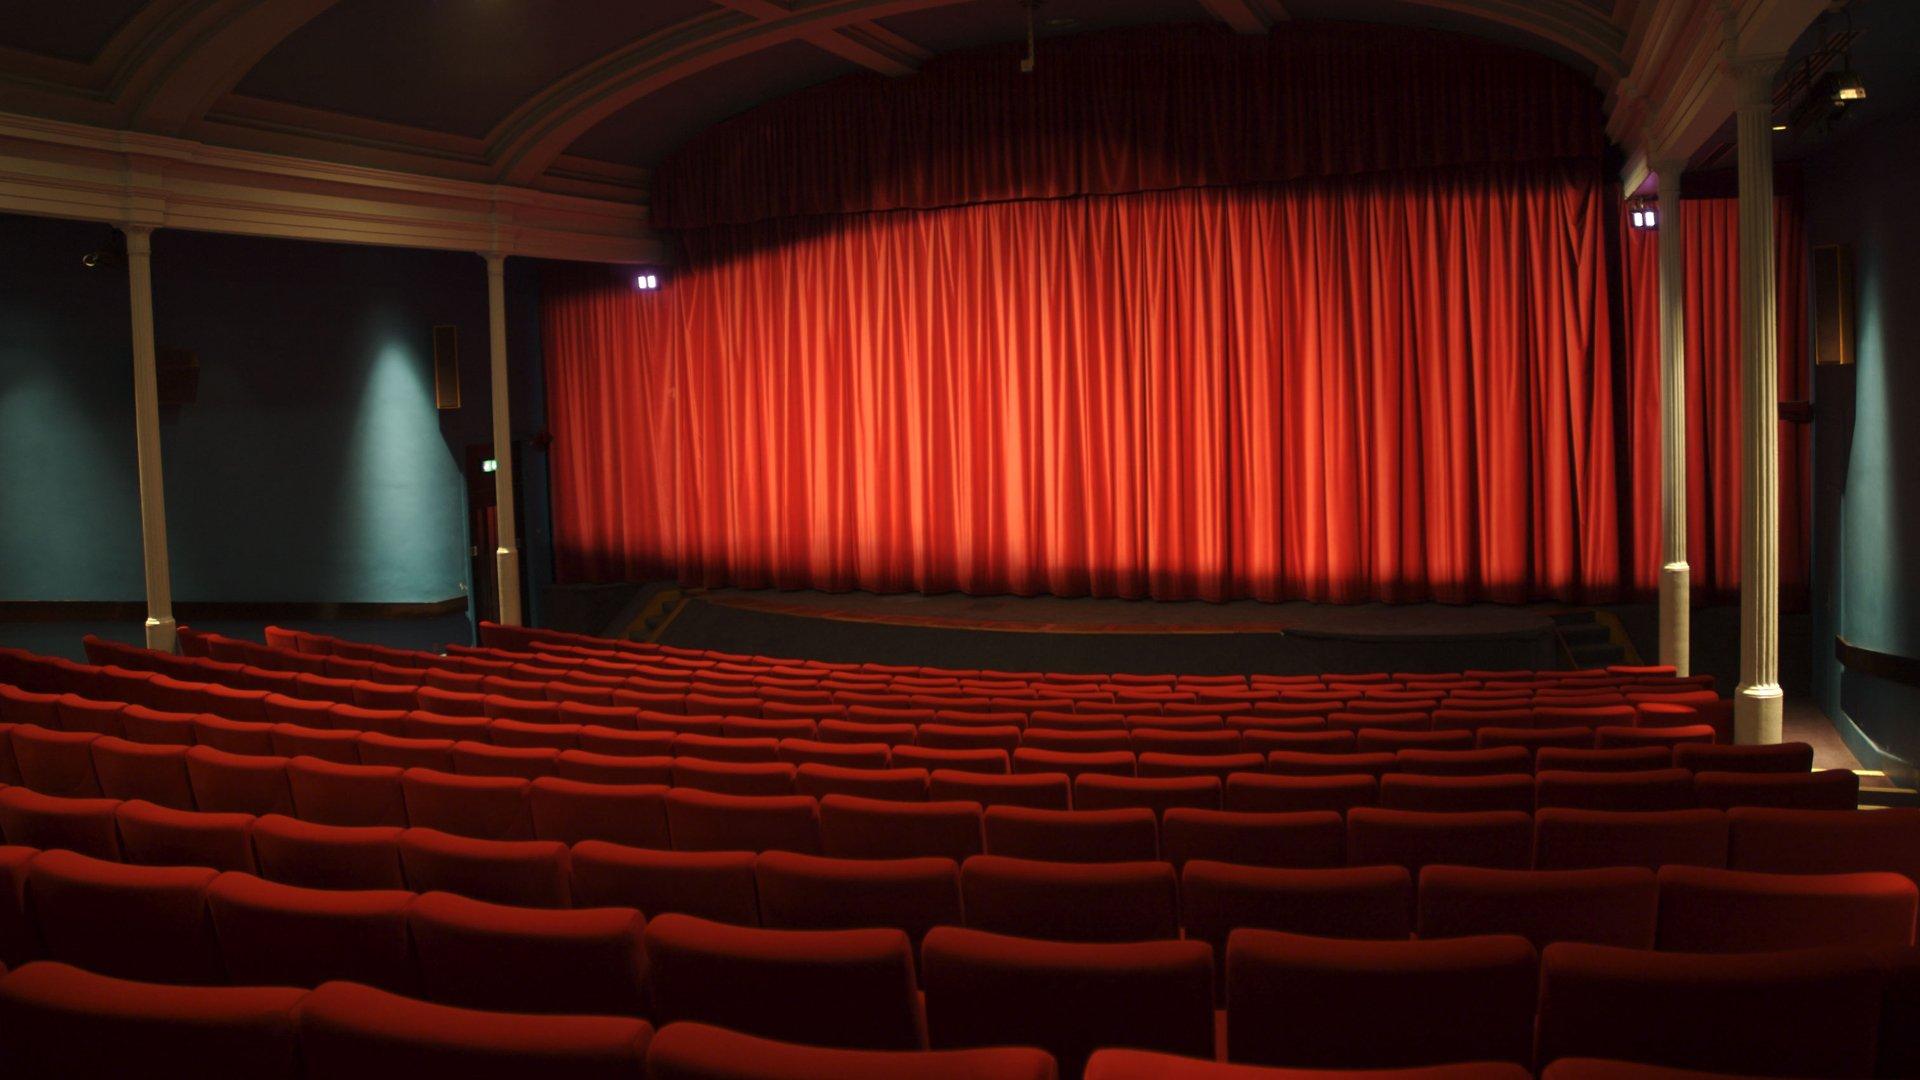 Home theater wallpaper wallpapersafari - Home theater wallpaper ...